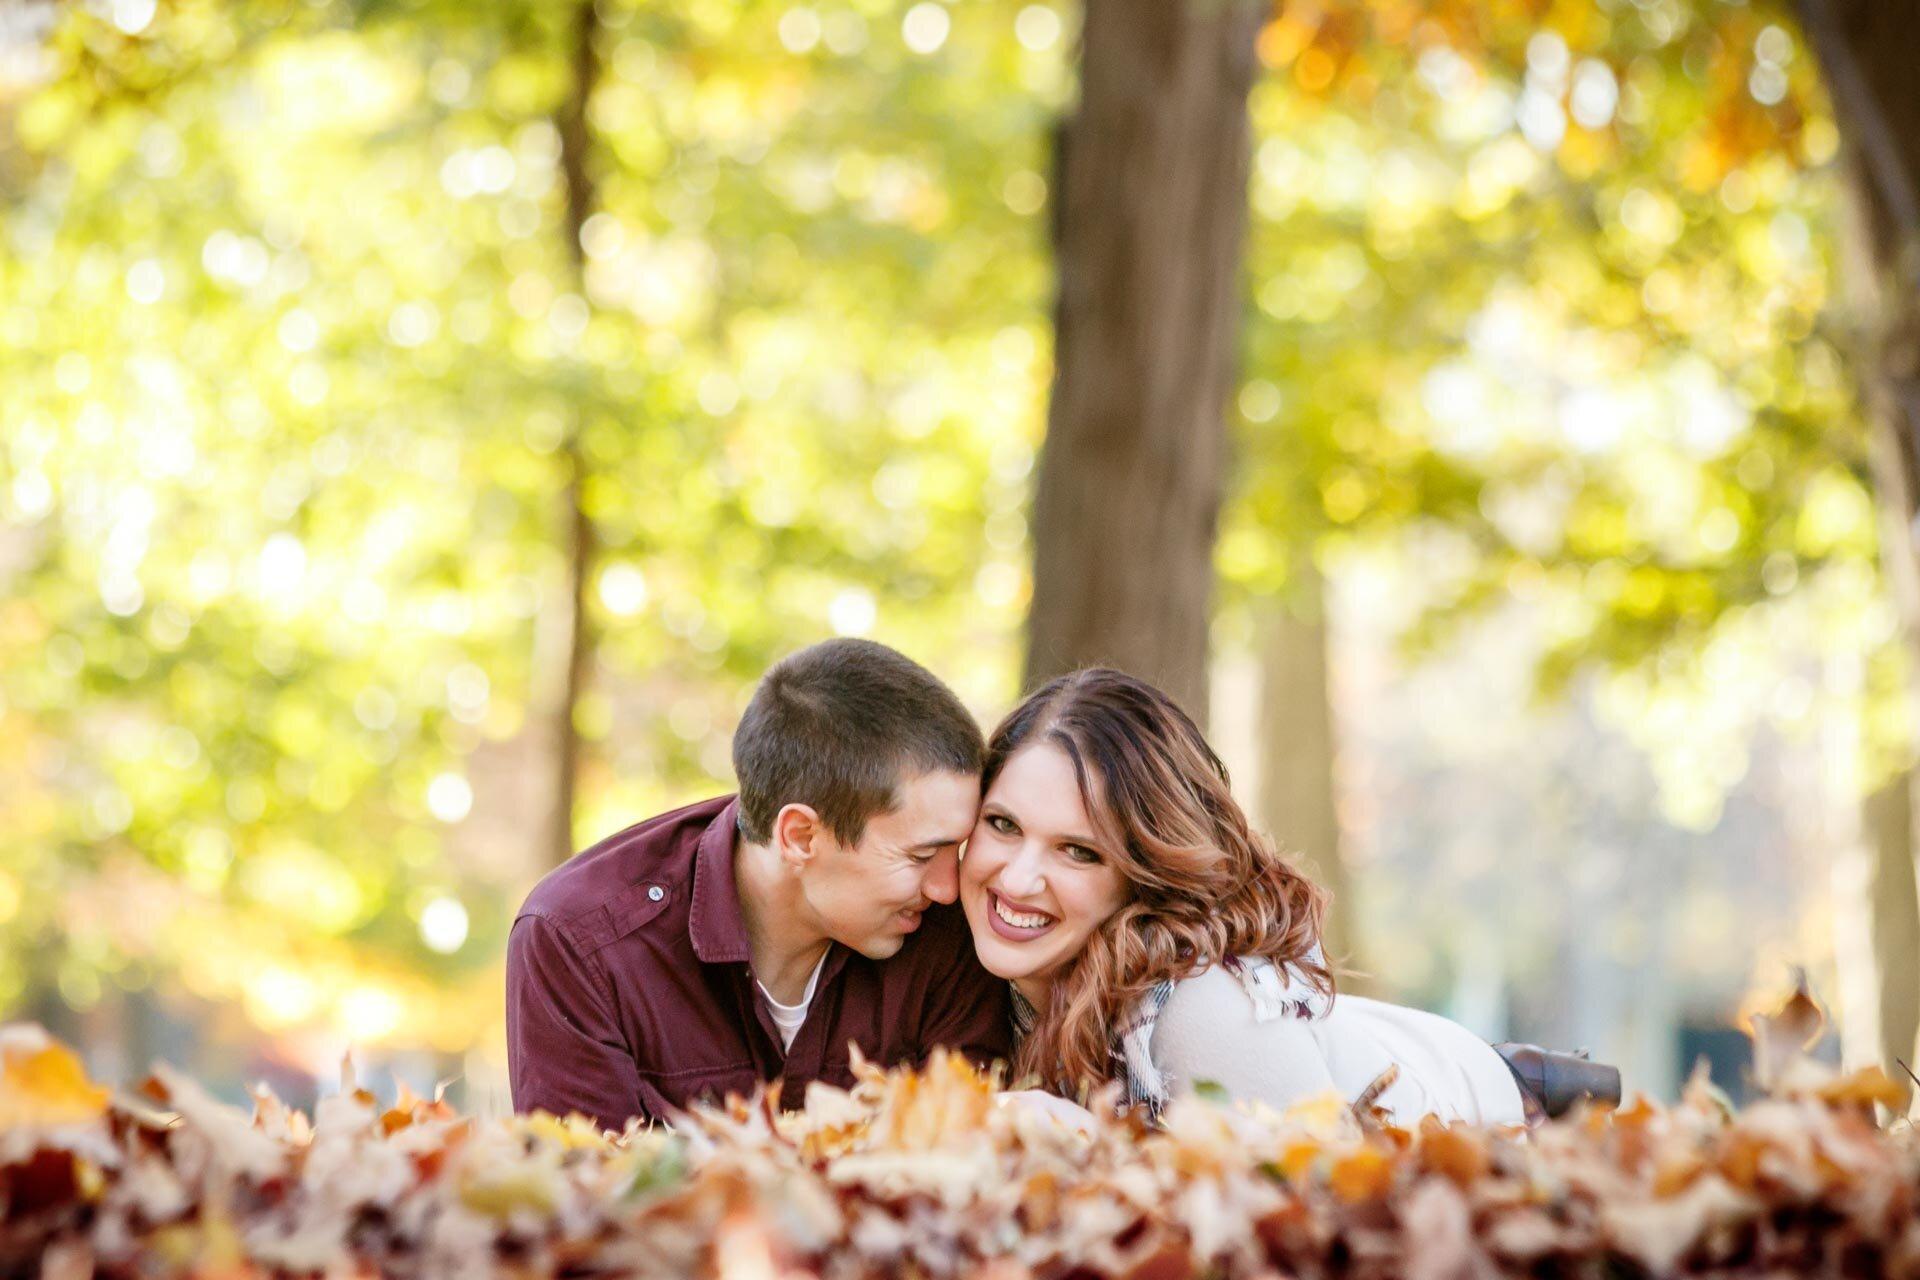 adam-shea-photography-fall-autumn-lighting-engagement-wedding-photos-adam-shea-photography-green-bay-appleton-neenah-photographer-17.jpg